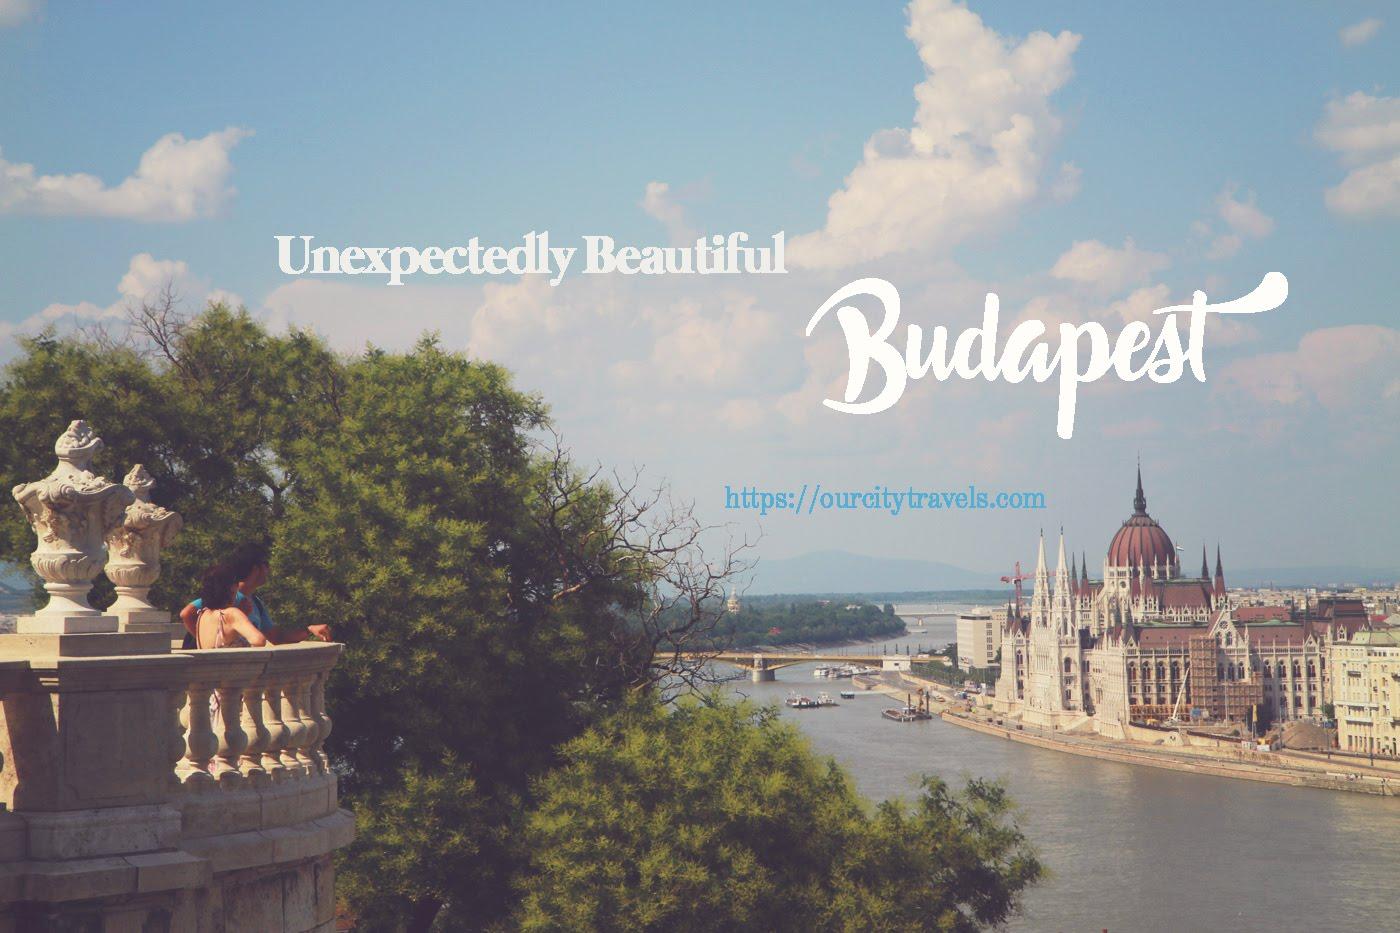 Budapest, Unexpectedly Beautiful